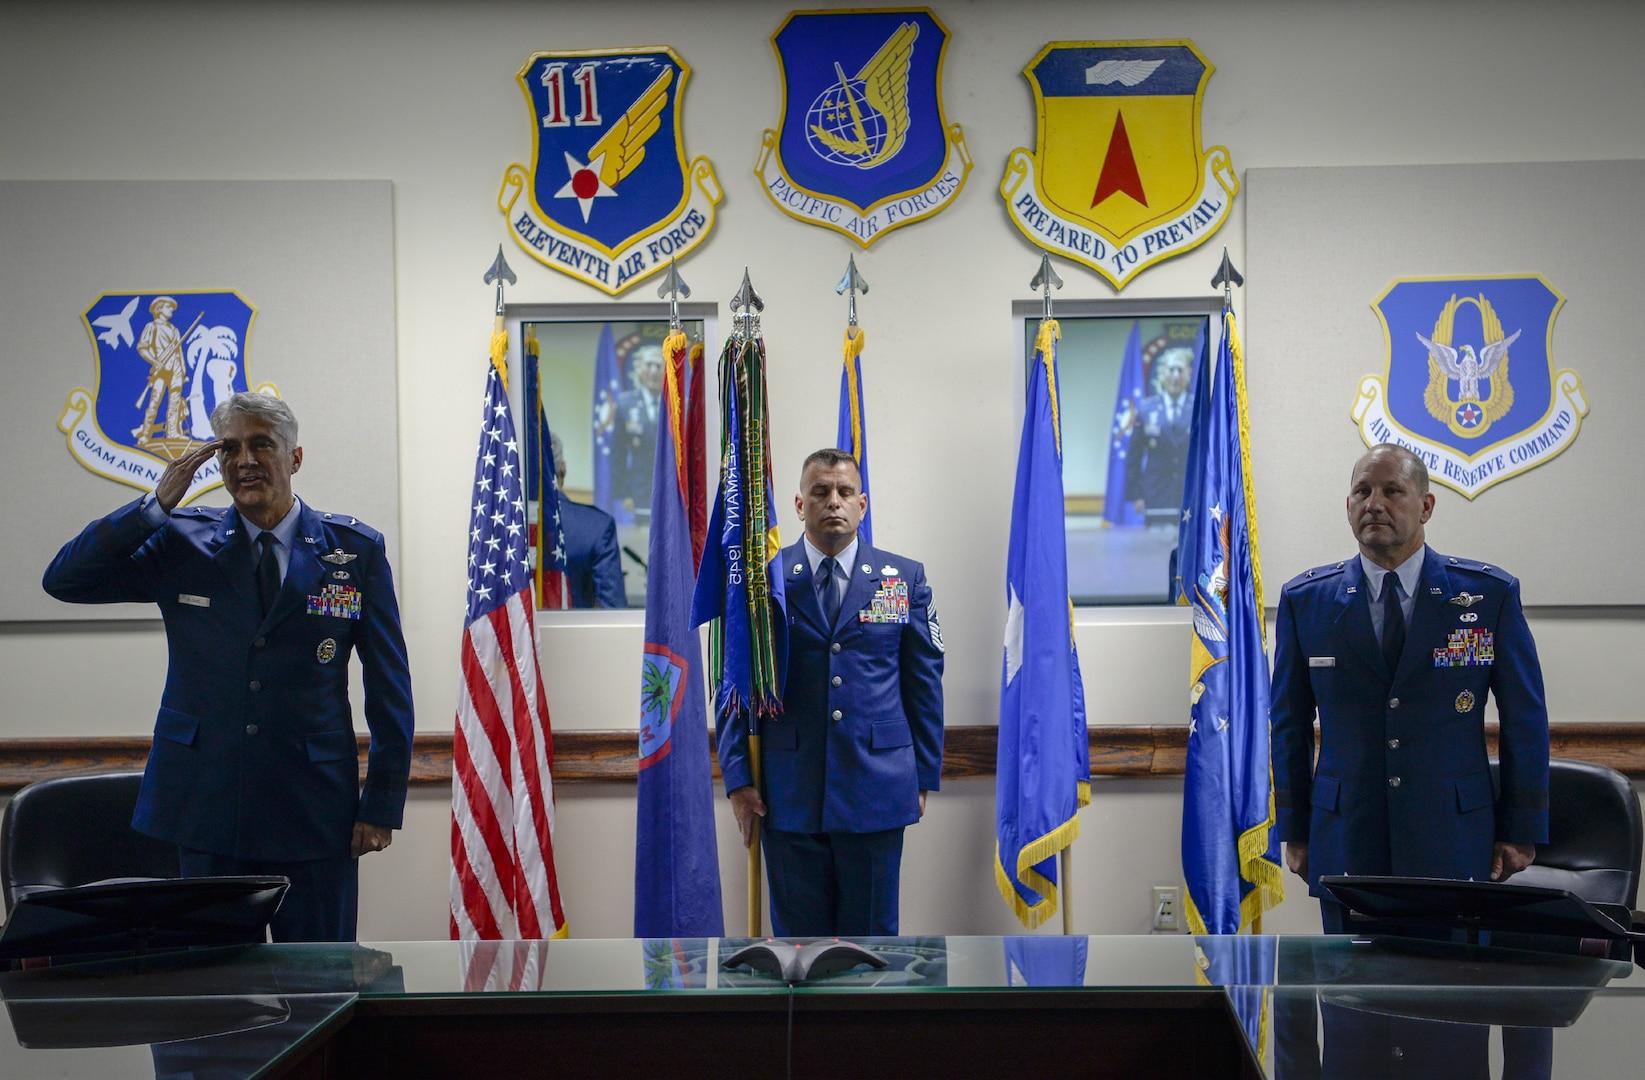 Team Andersen welcomes Brig. Gen. Sloane as new Commander